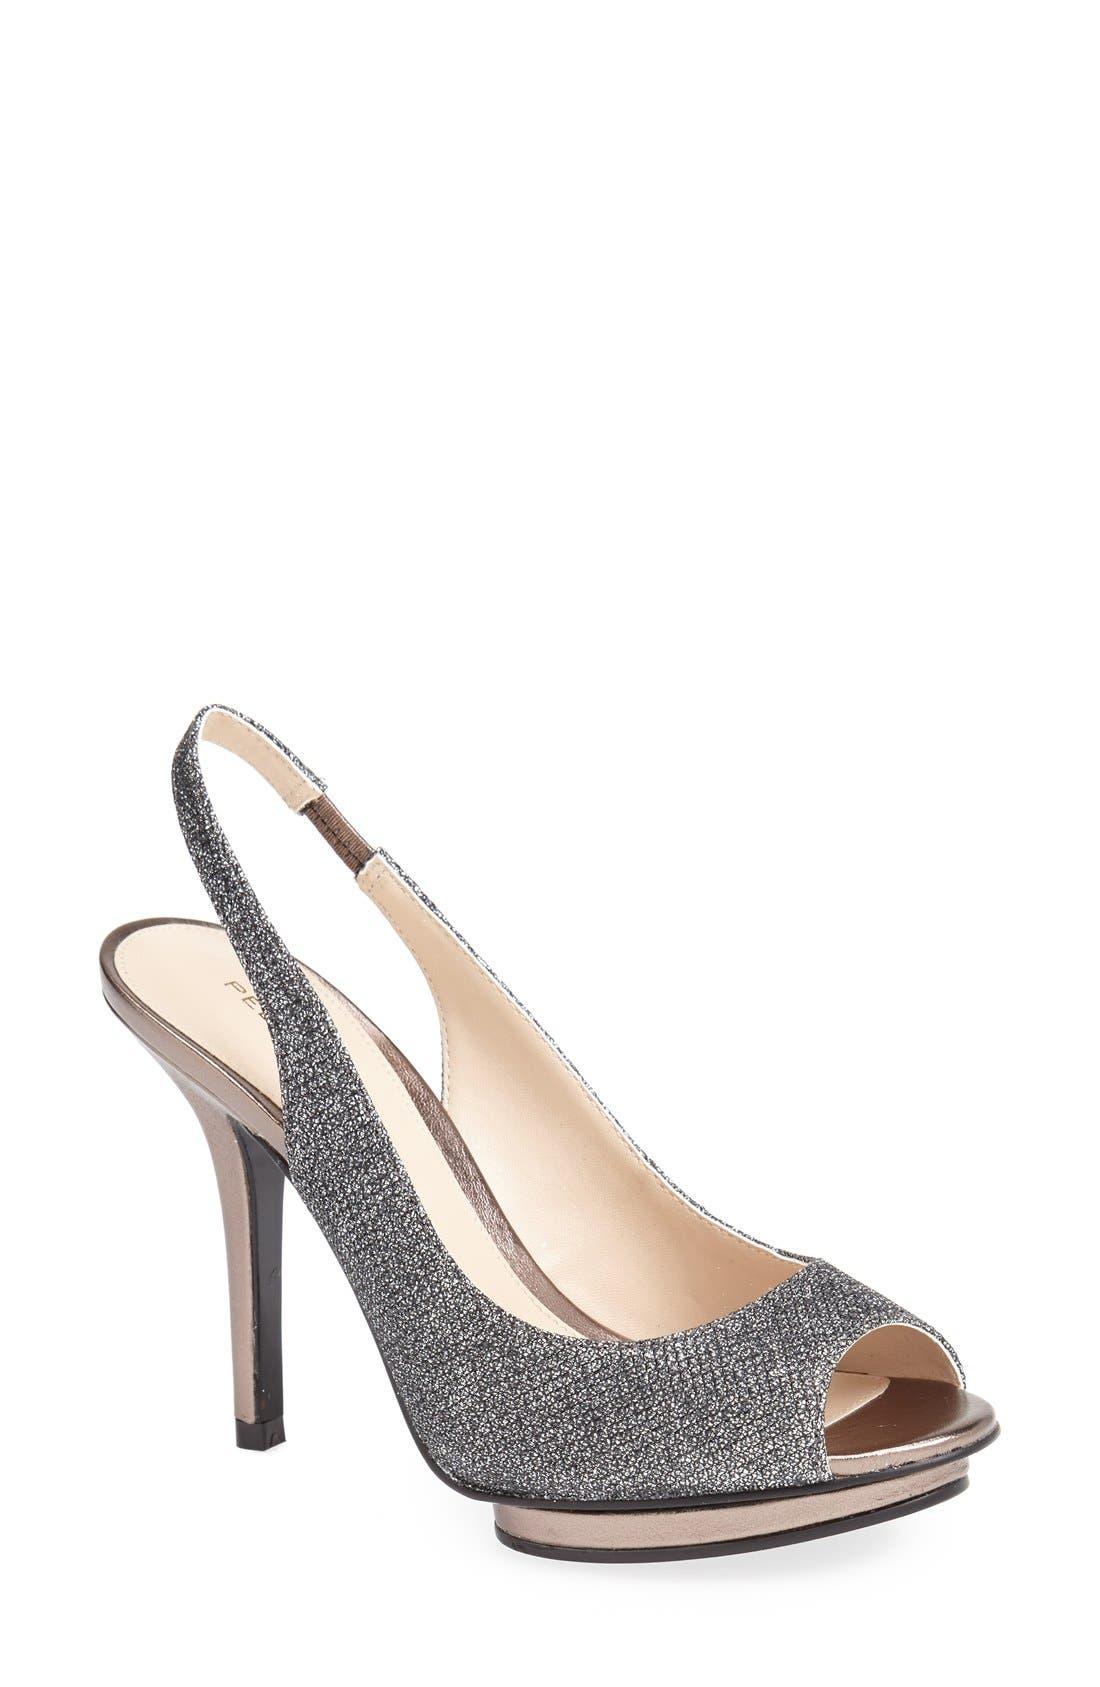 Main Image - Pelle Moda 'Rivka' Open Toe Platform Slingback Sandal (Women)